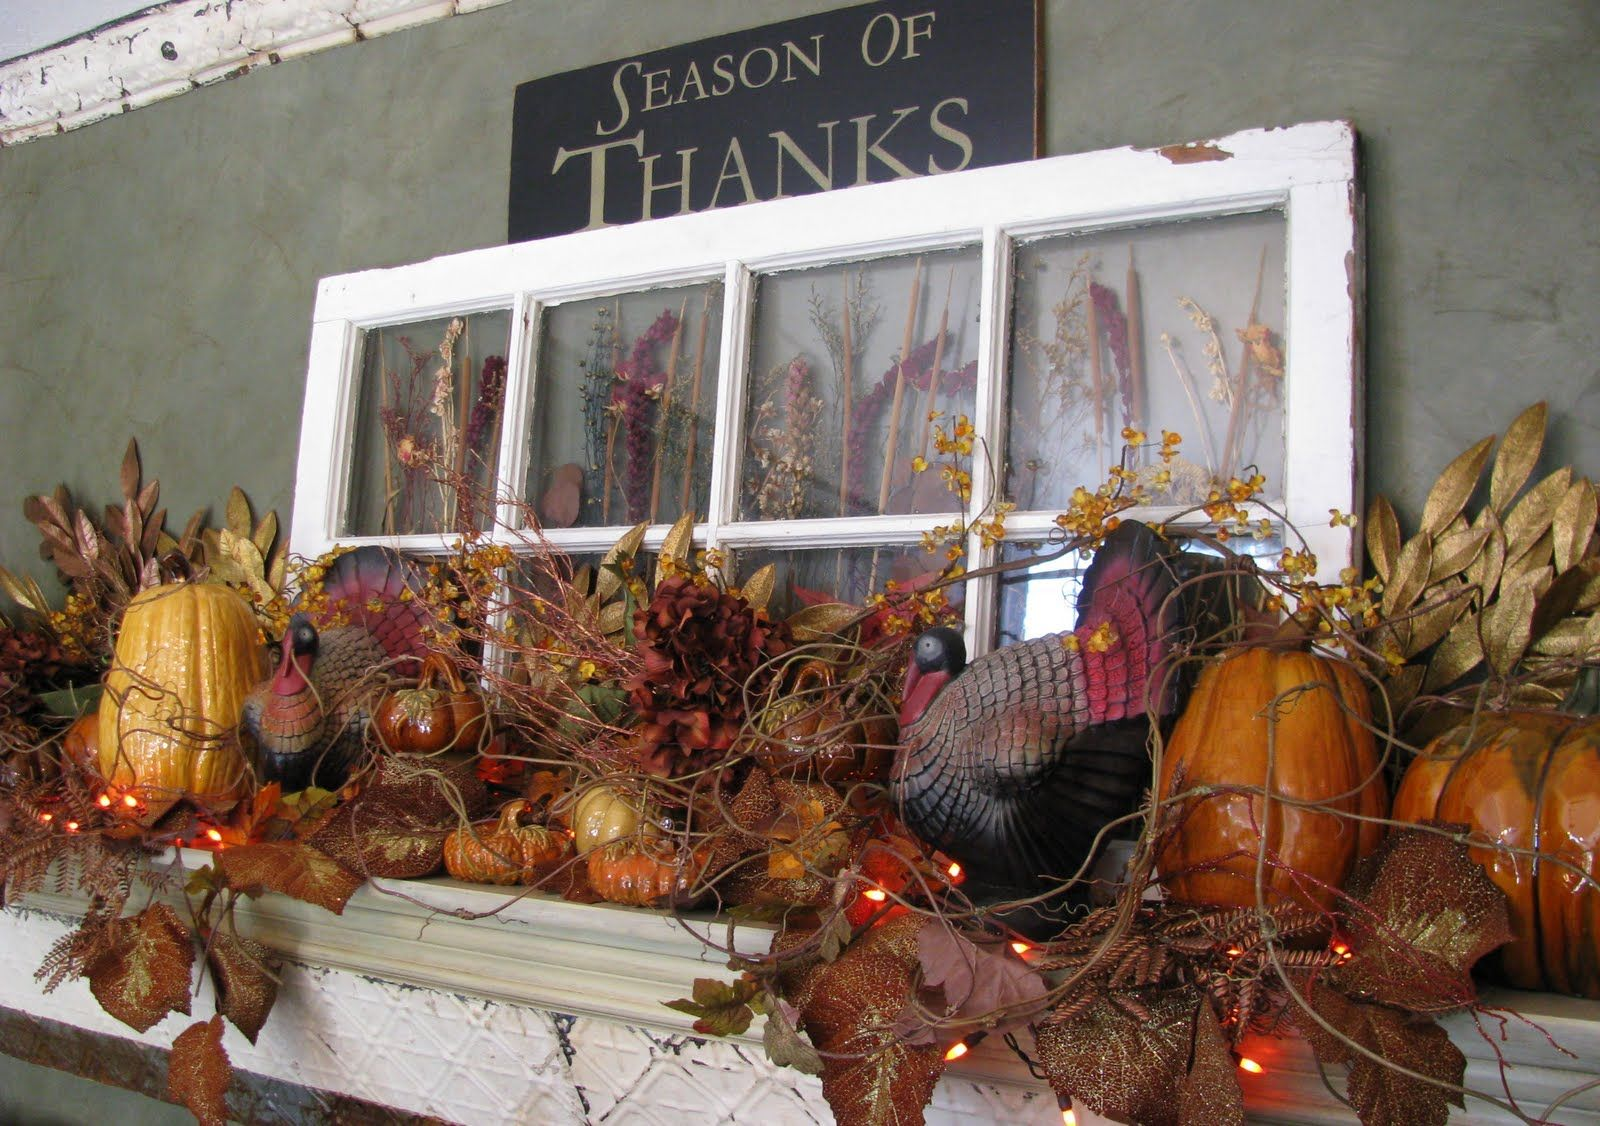 Best 25+ Autumn mantel ideas on Pinterest | Fall mantle decor ...